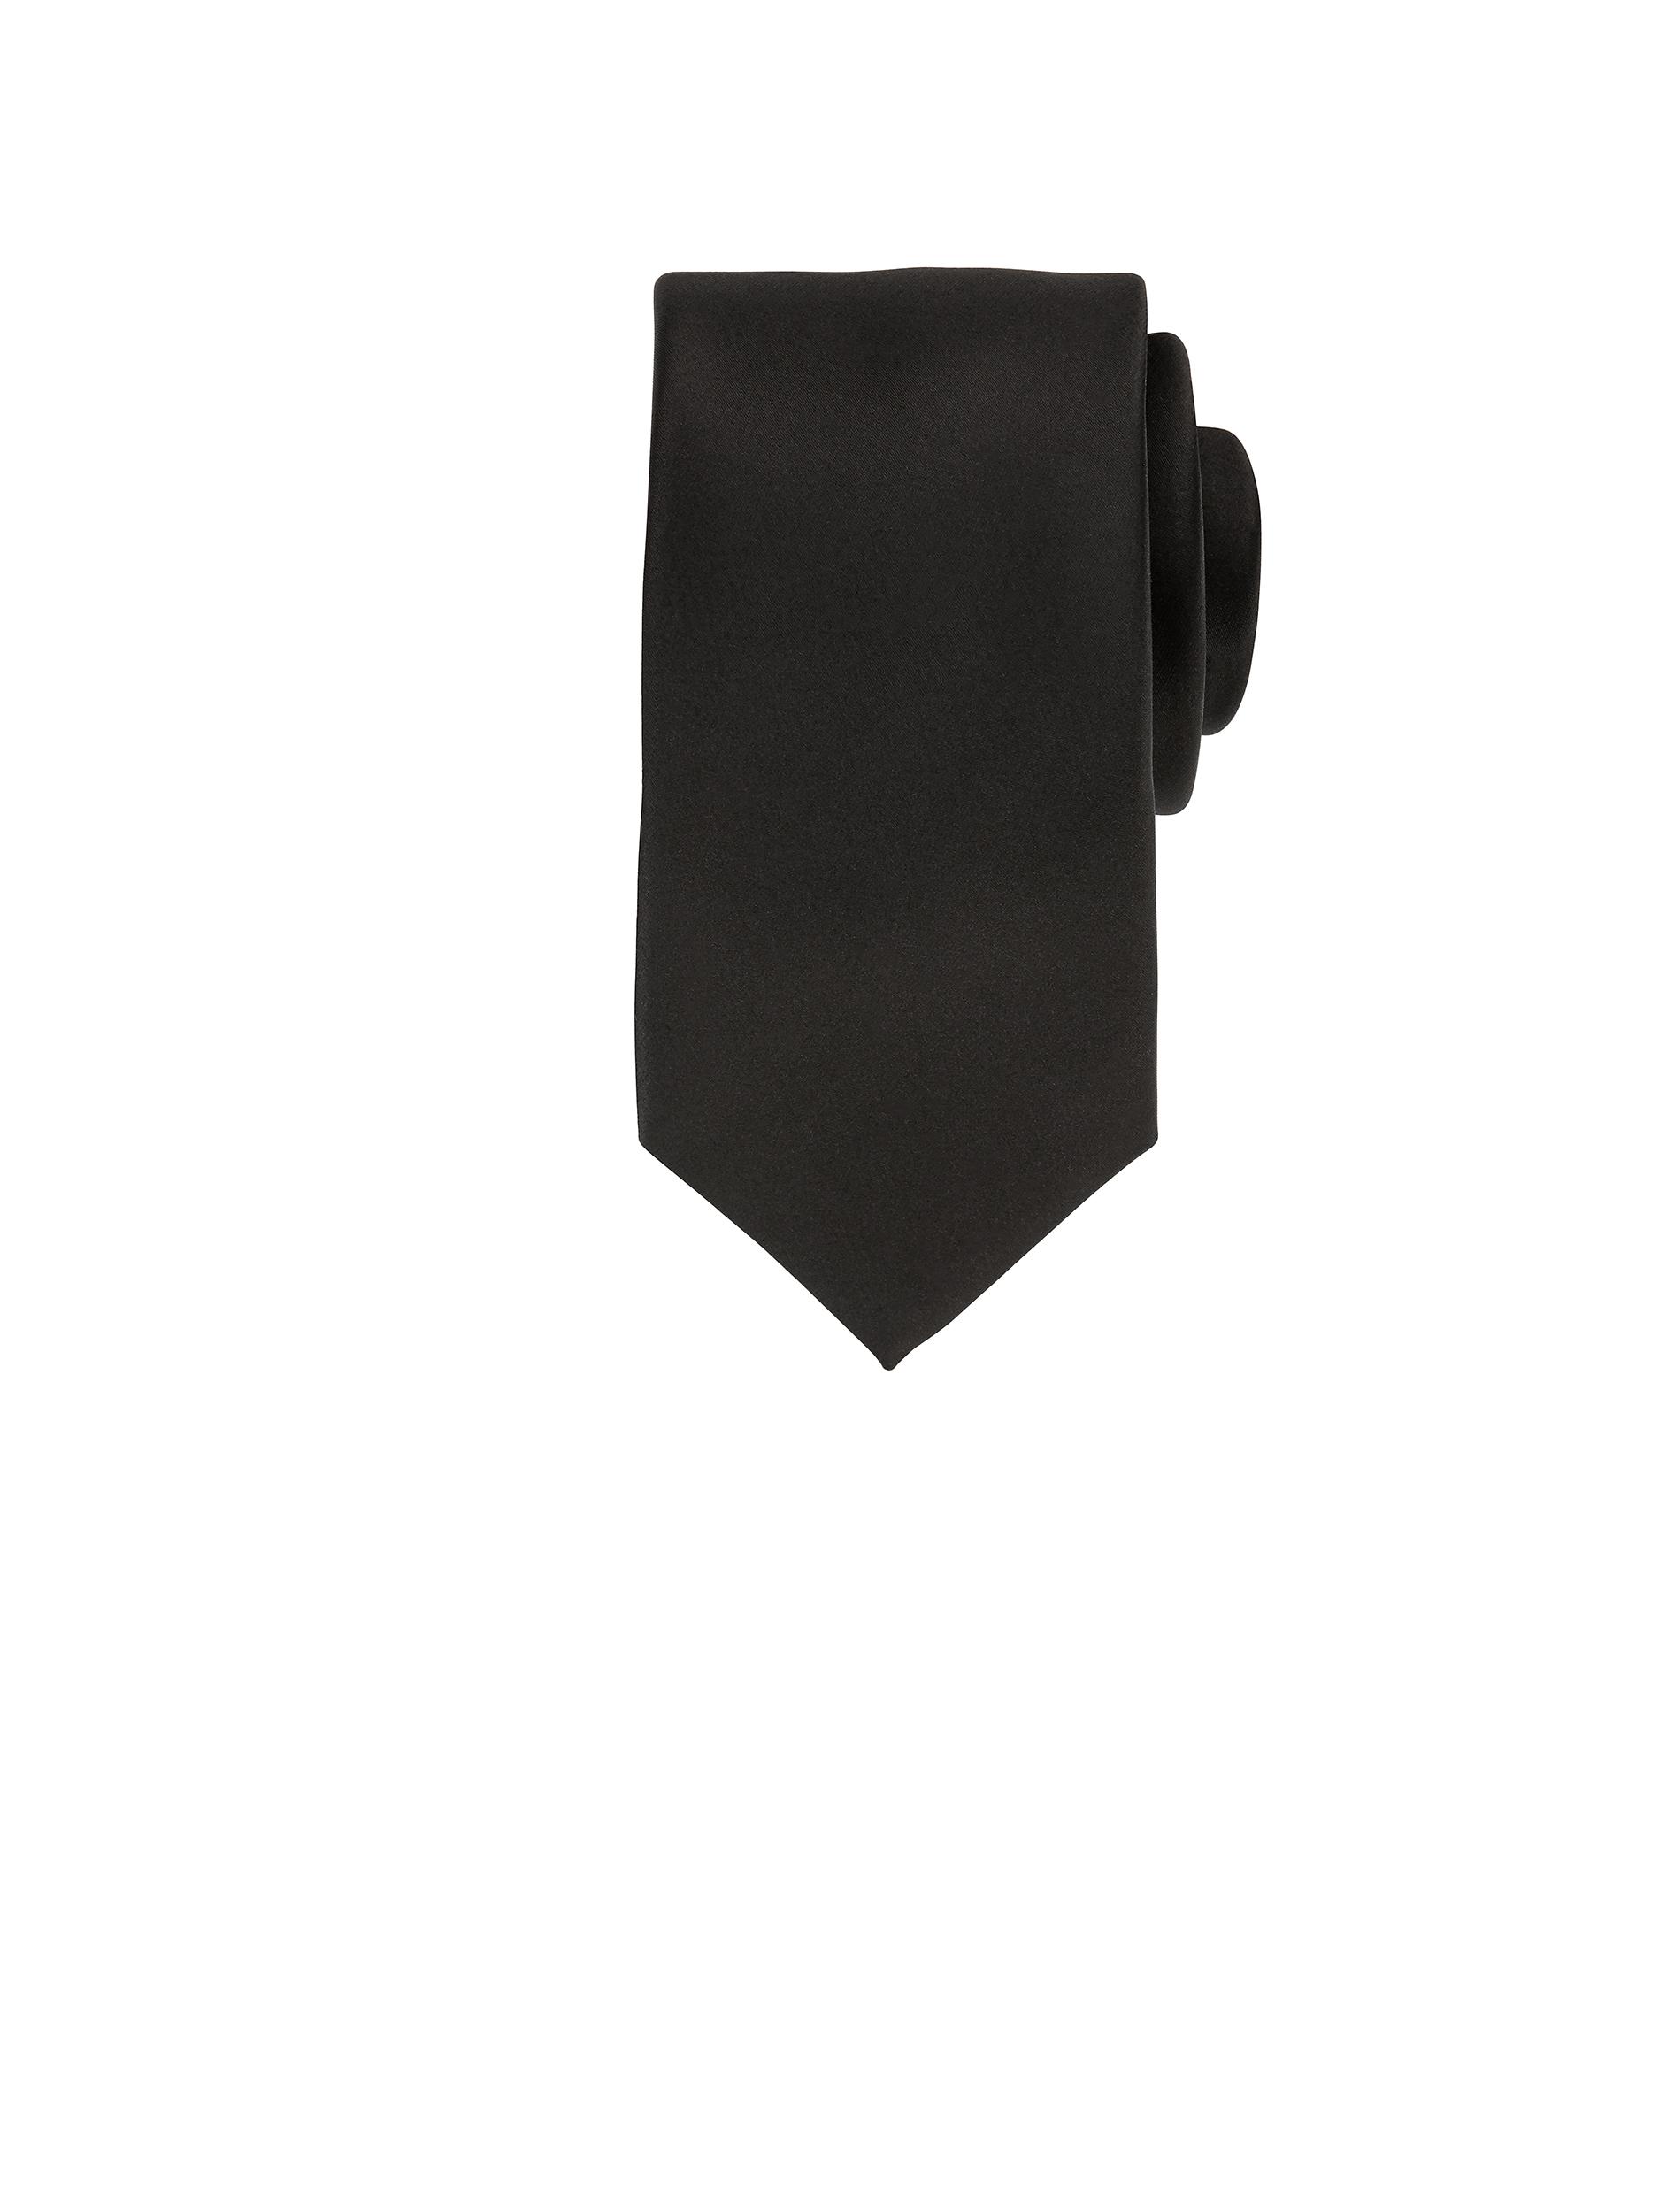 Solid Beige Boys 14 Clip On Tie